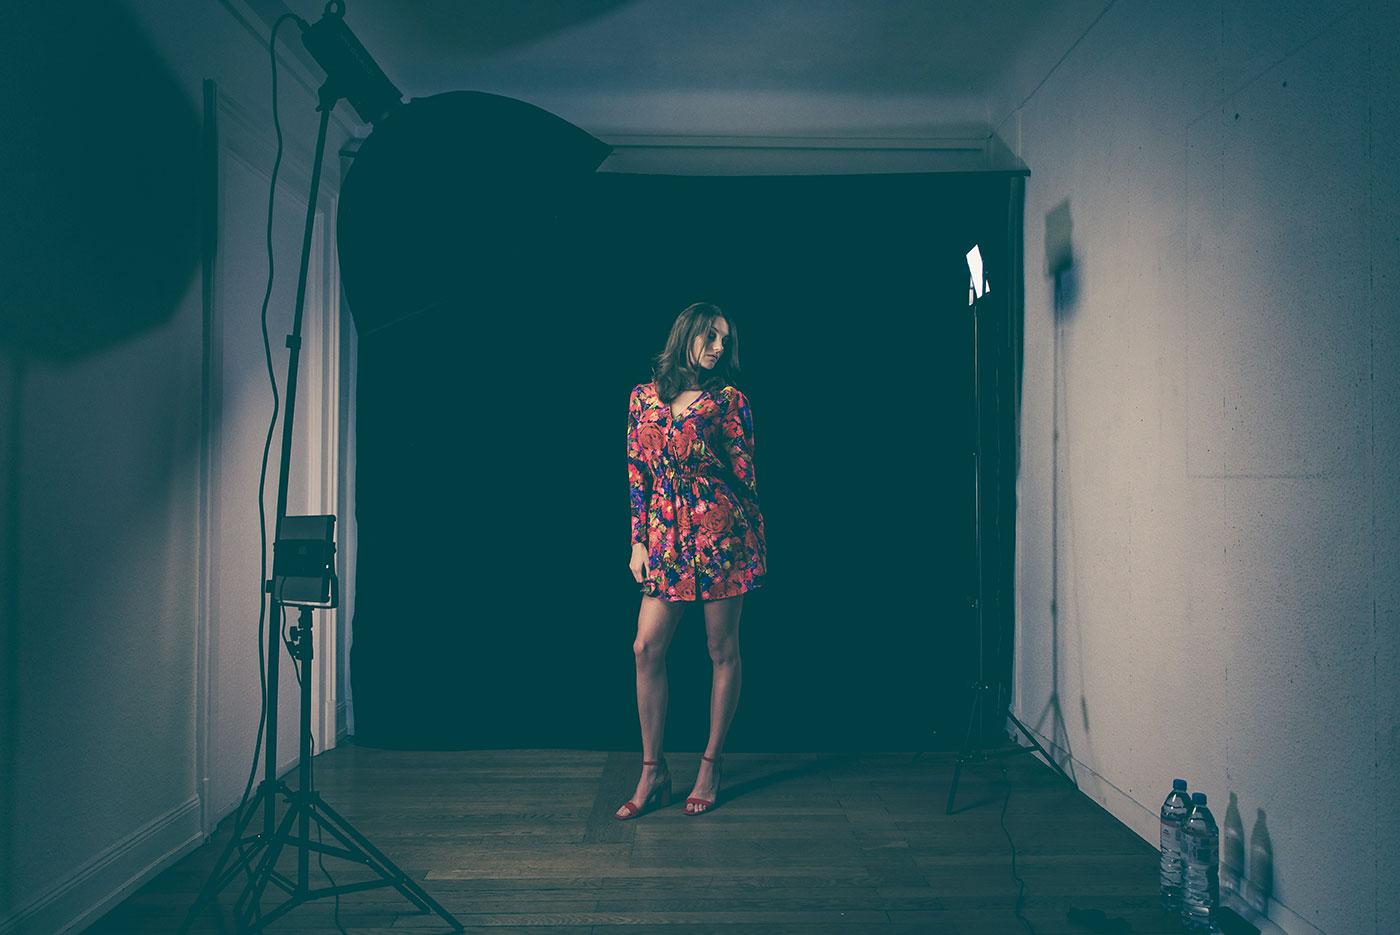 Studio Photo - Photographe Professionnel Strasbourg & France : Portraits / Corporate / Evénements